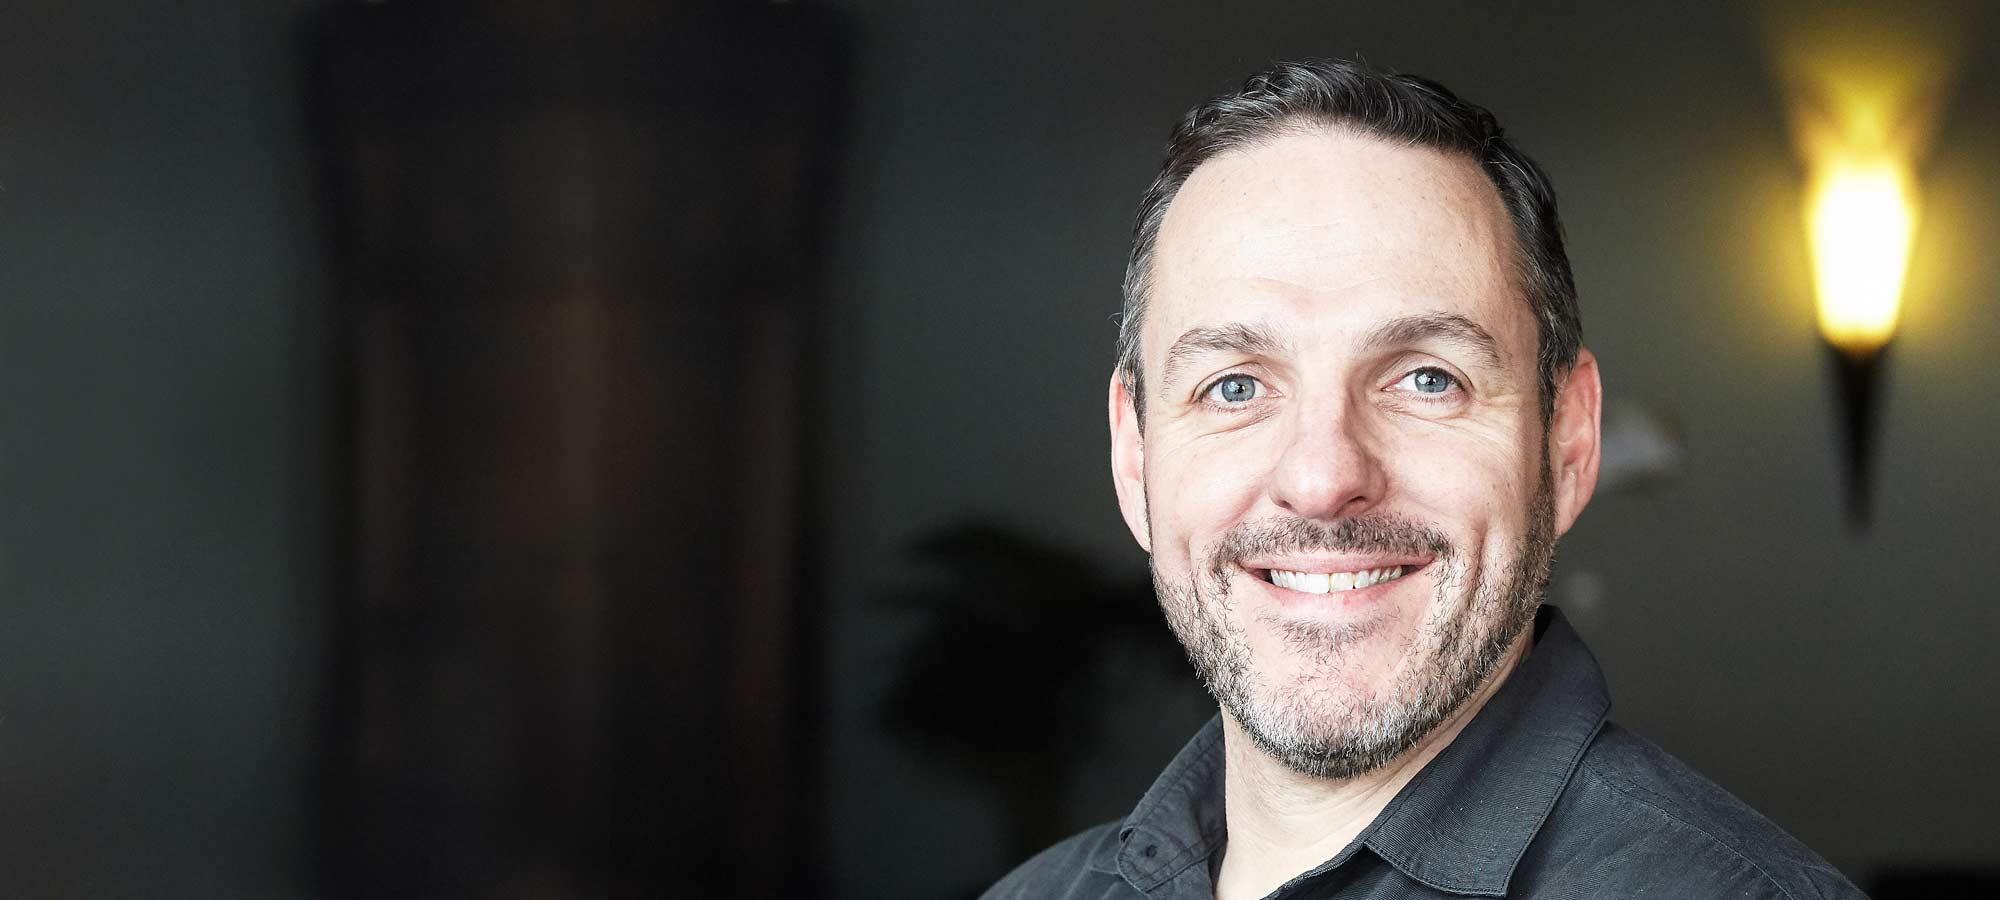 David Reiss, Principal Consultant - Digital Transformation, Equinox IT Auckland